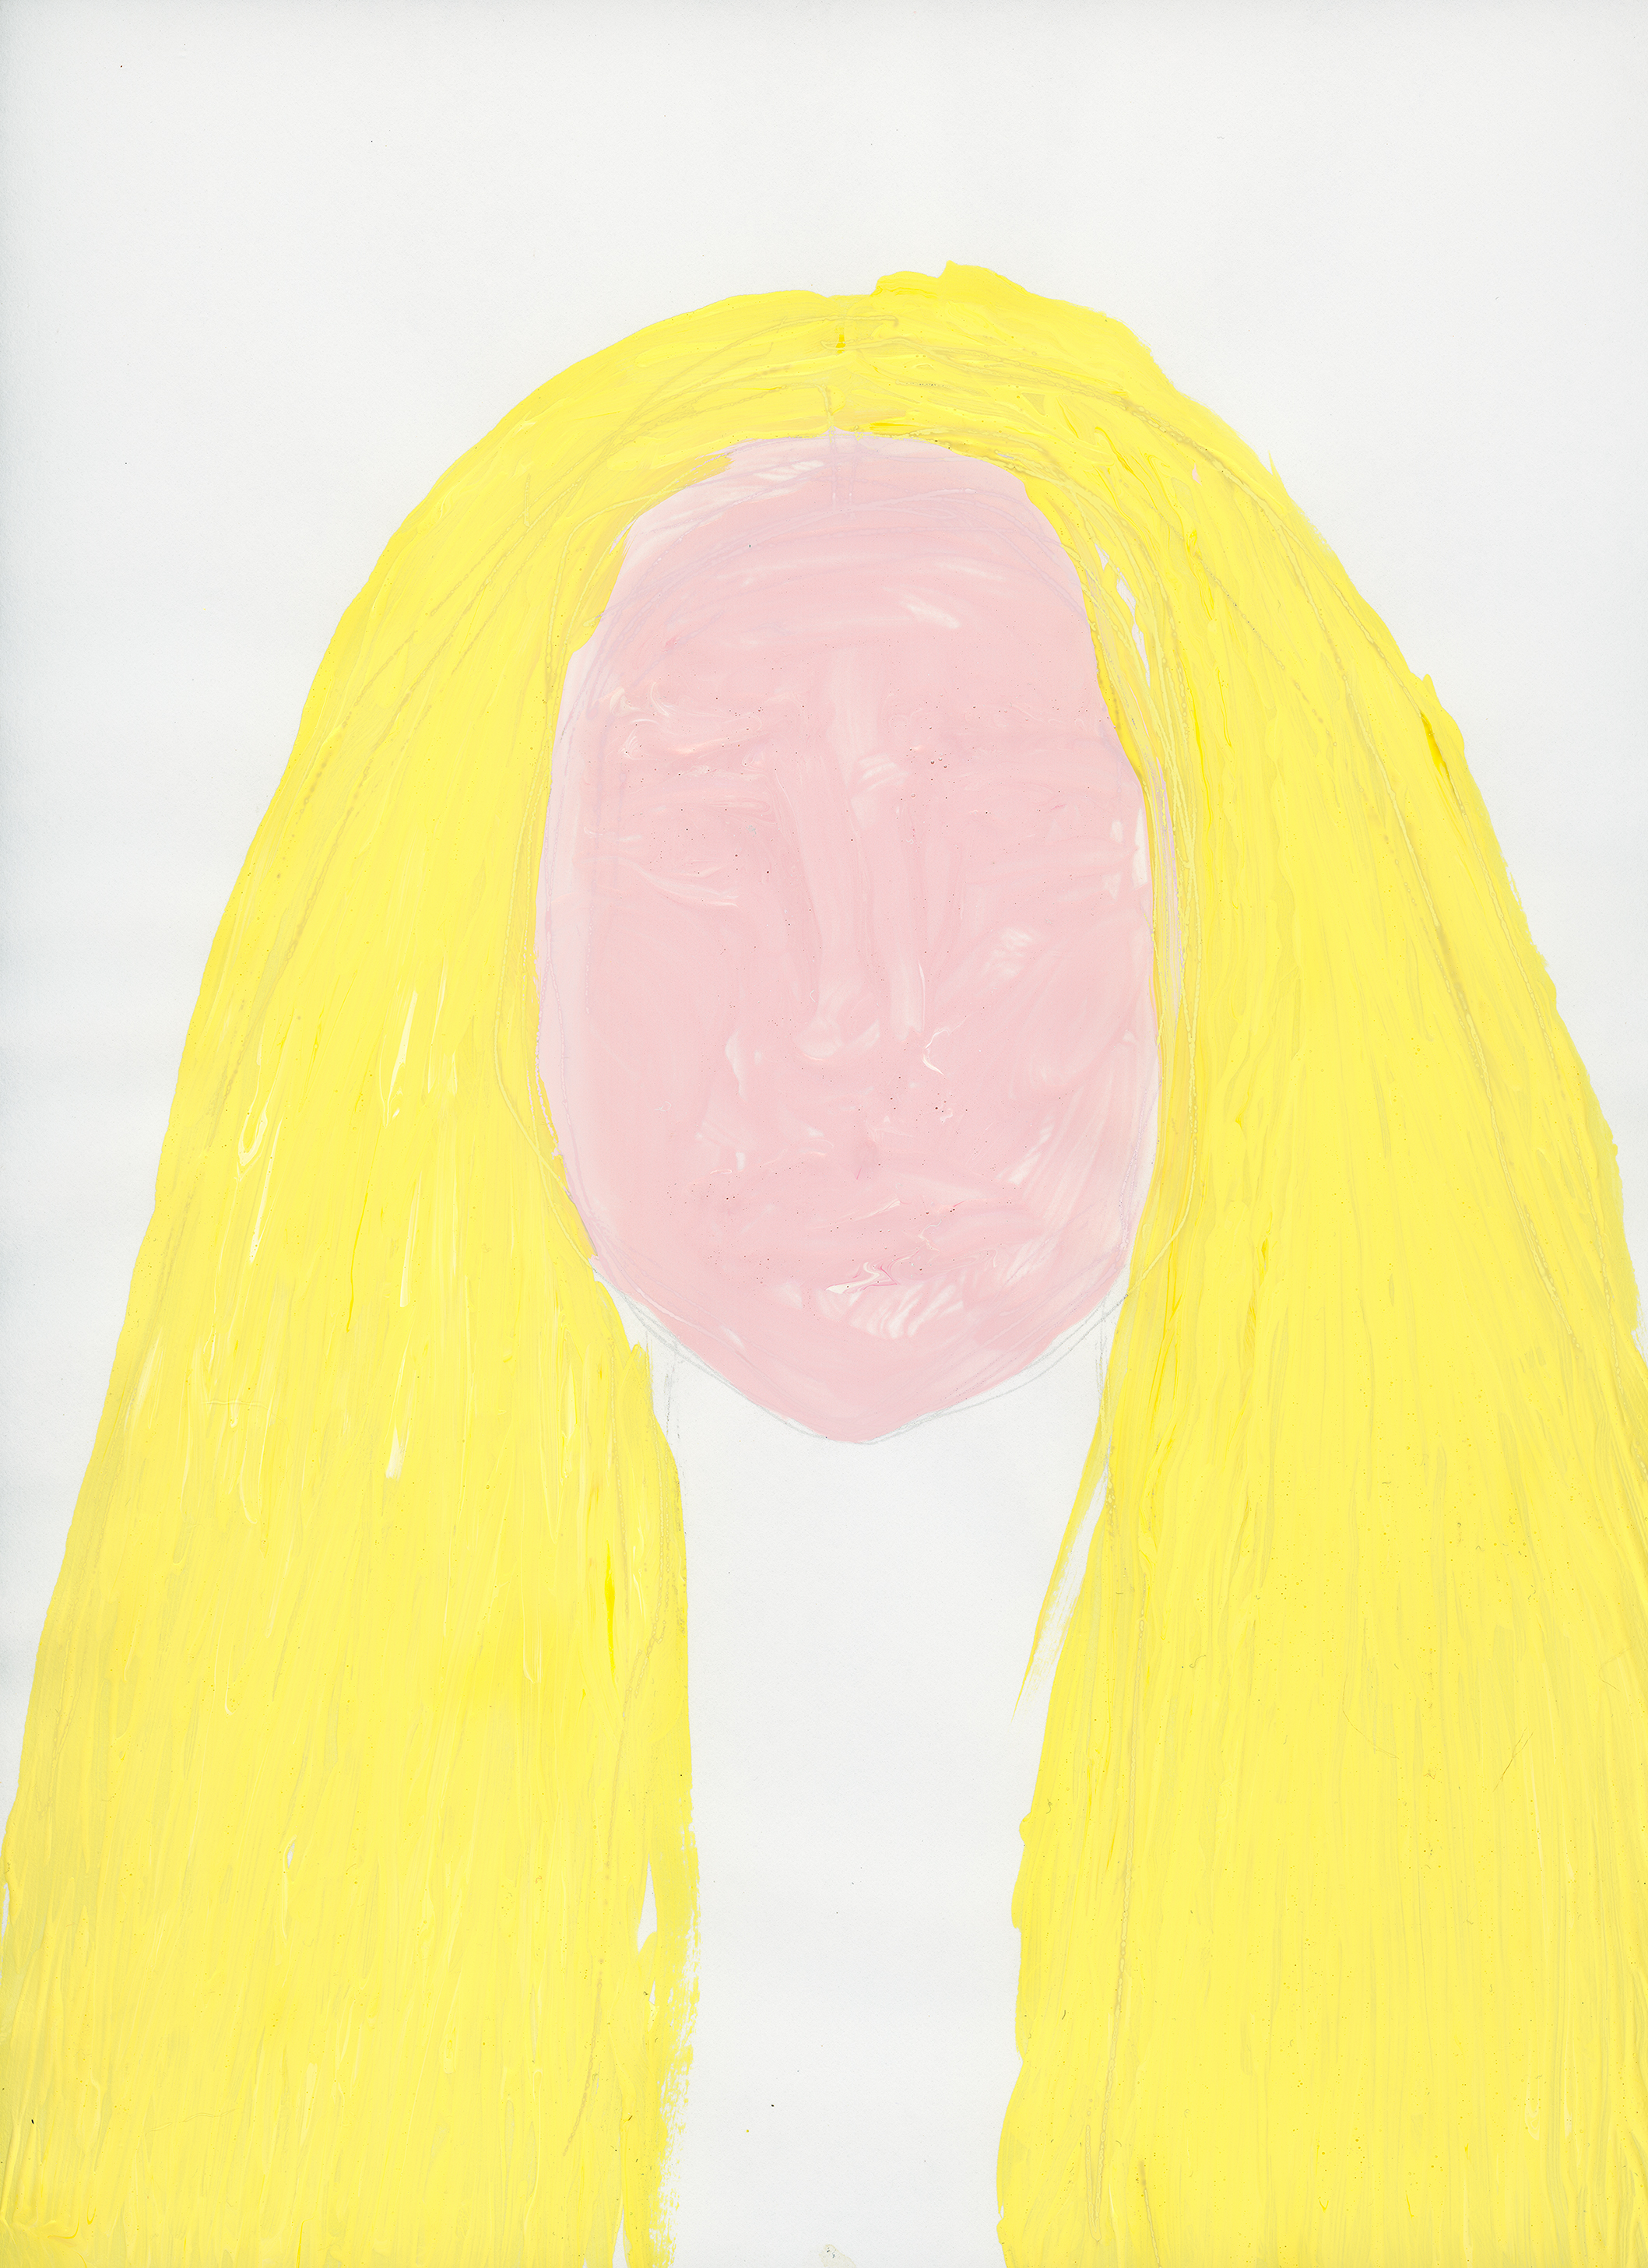 pink and yellow selfie005_EDIT.jpg